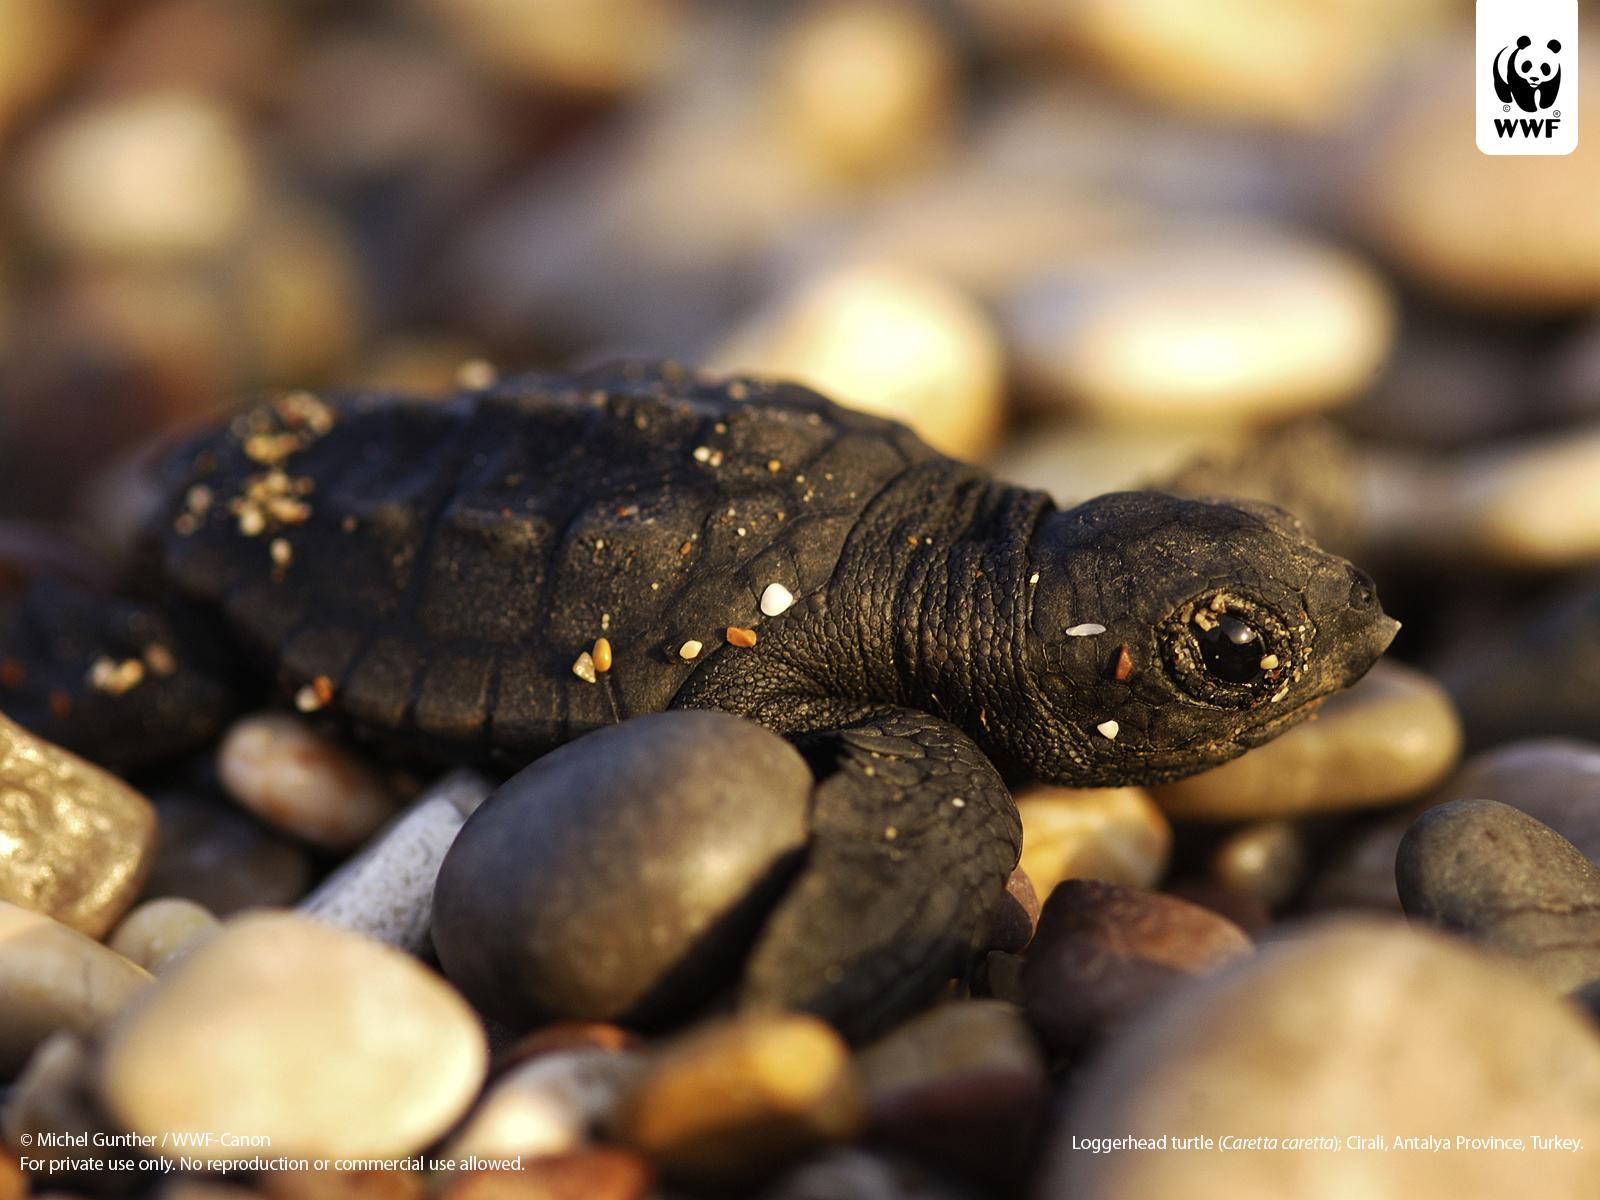 http://2.bp.blogspot.com/-vjAgXE4Cqvc/T88YhKNDFYI/AAAAAAAACCg/iHuB_9C82w0/s1600/loggerhead_turtle_wallpaper_pc110112.jpg